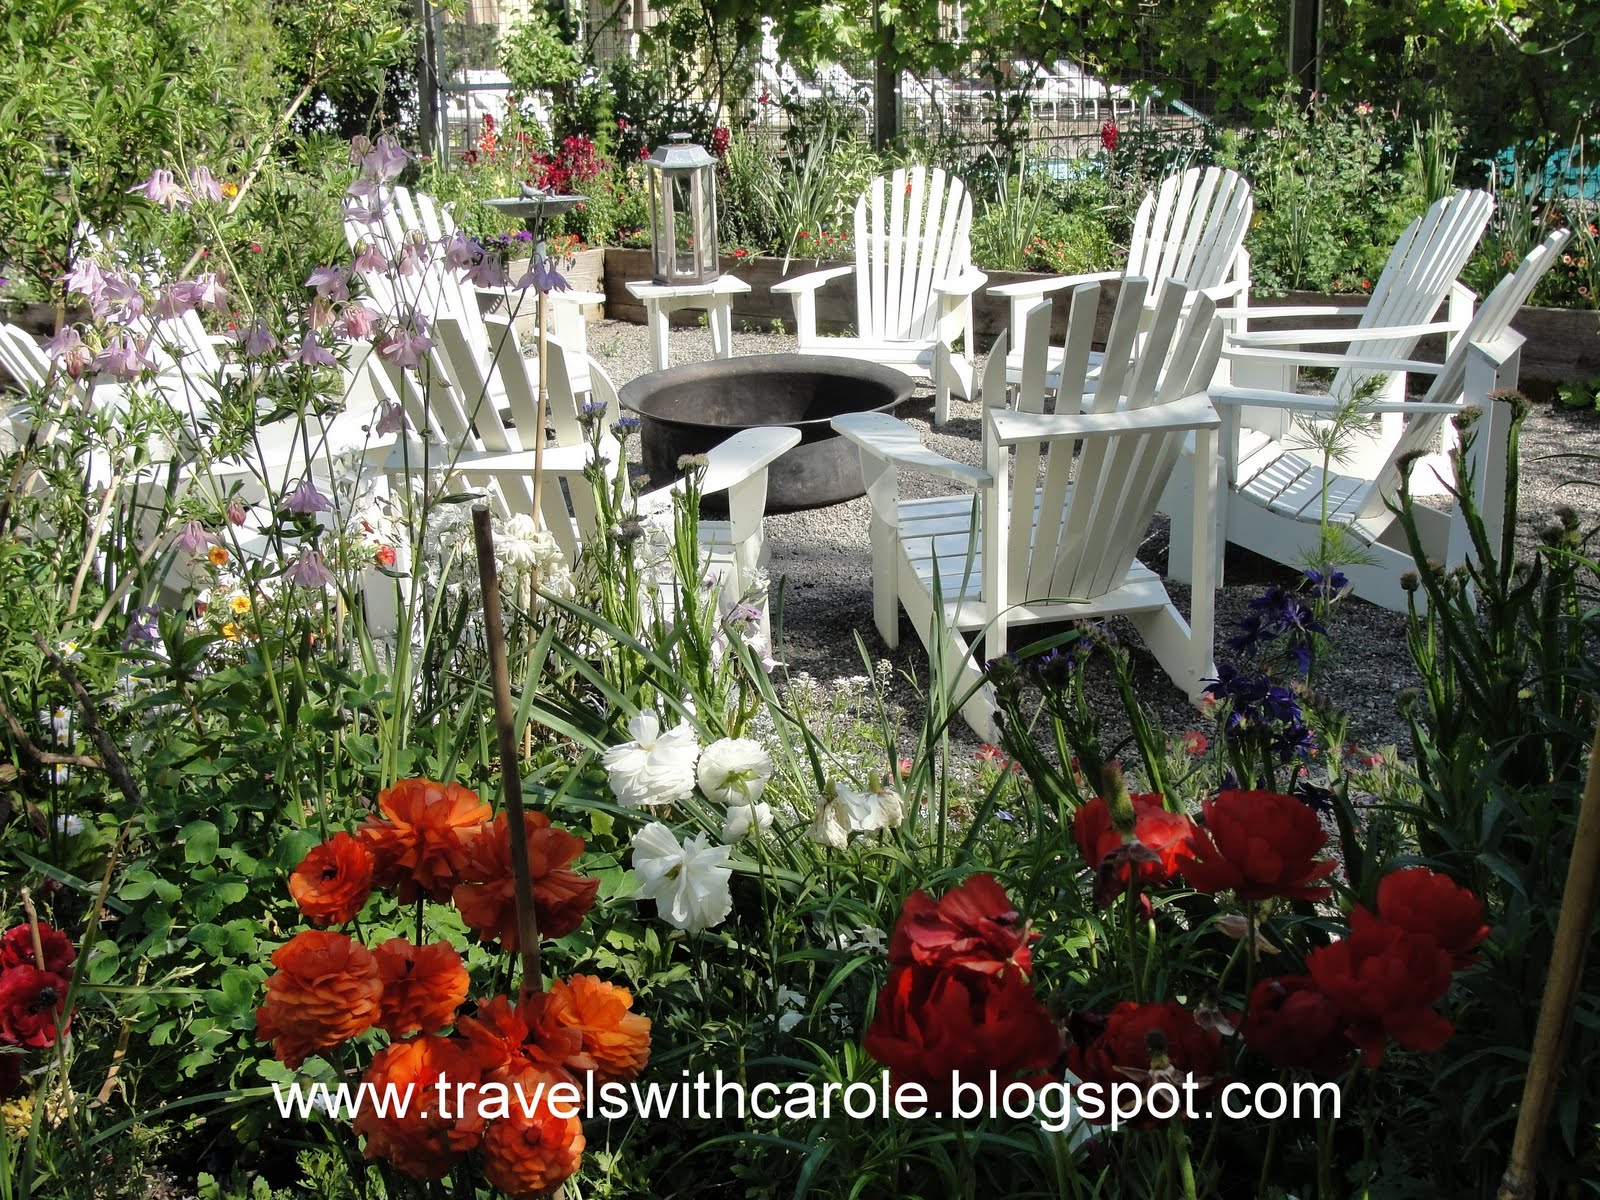 Adirondack chairs surround fire pit at The Farmhouse Inn ...